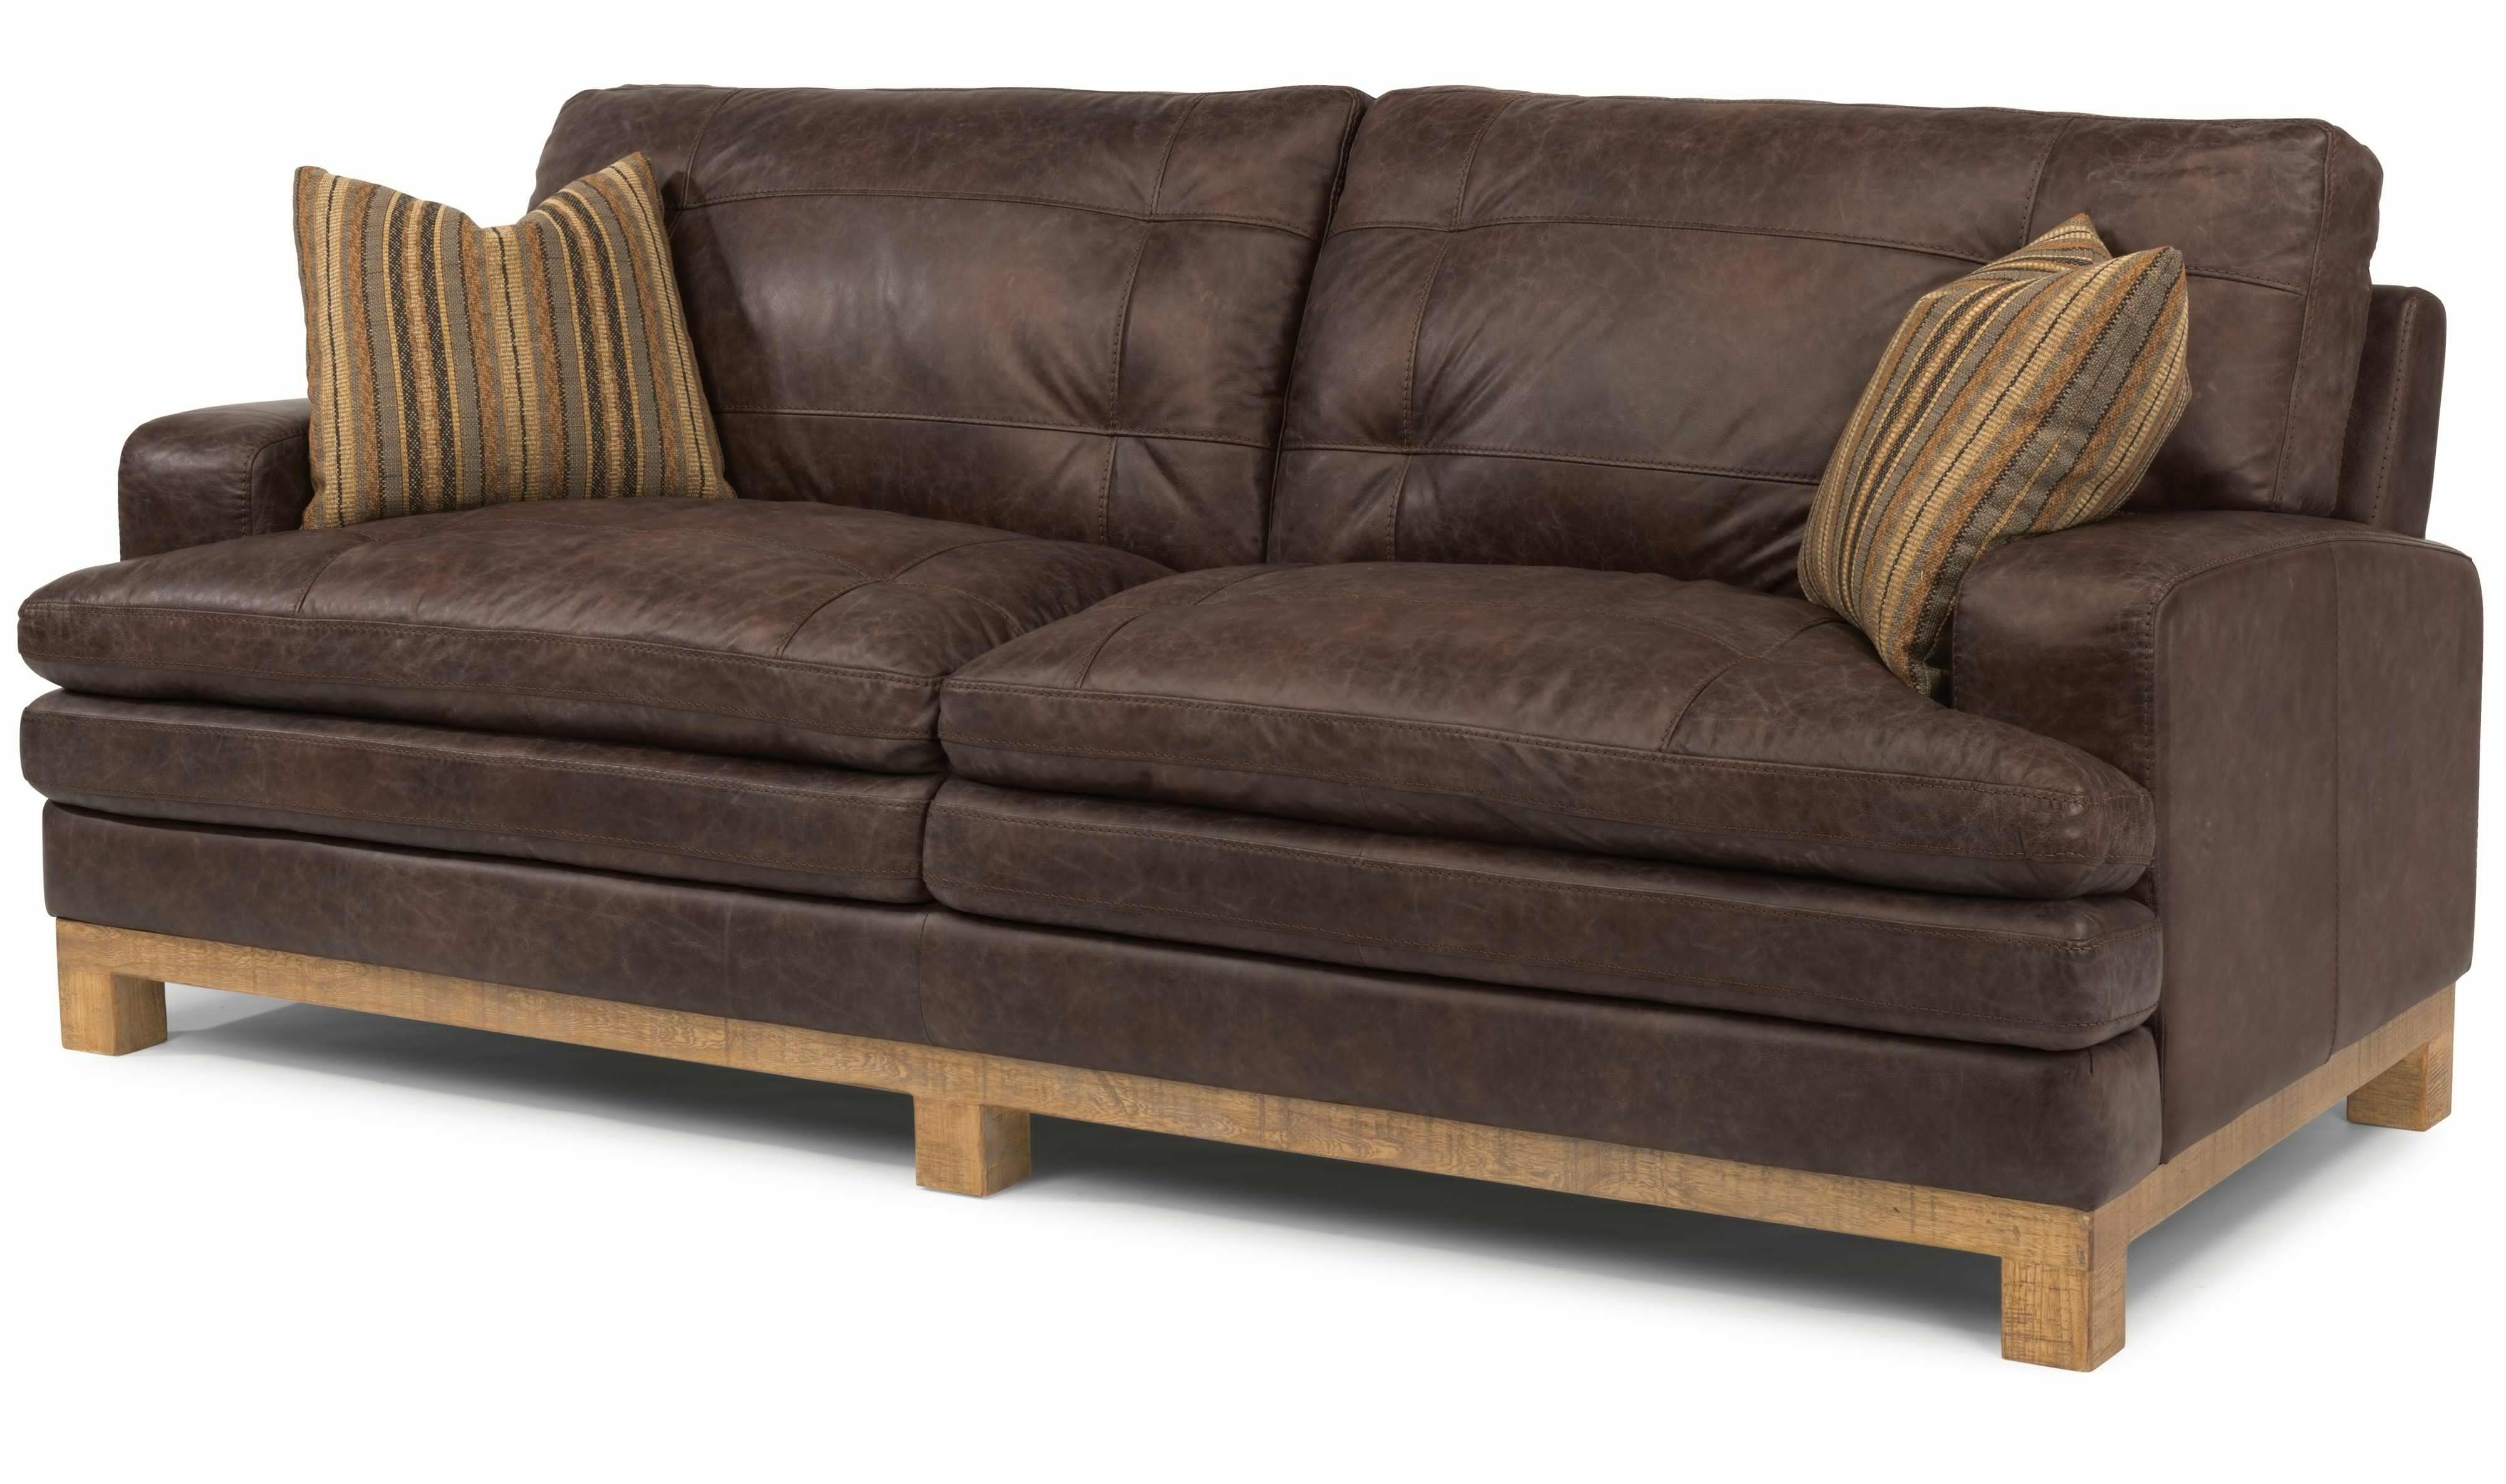 Sectional Sofa Design: Full Grain Leather Sectional Sofa With Current Full Grain Leather Sofas (View 15 of 20)